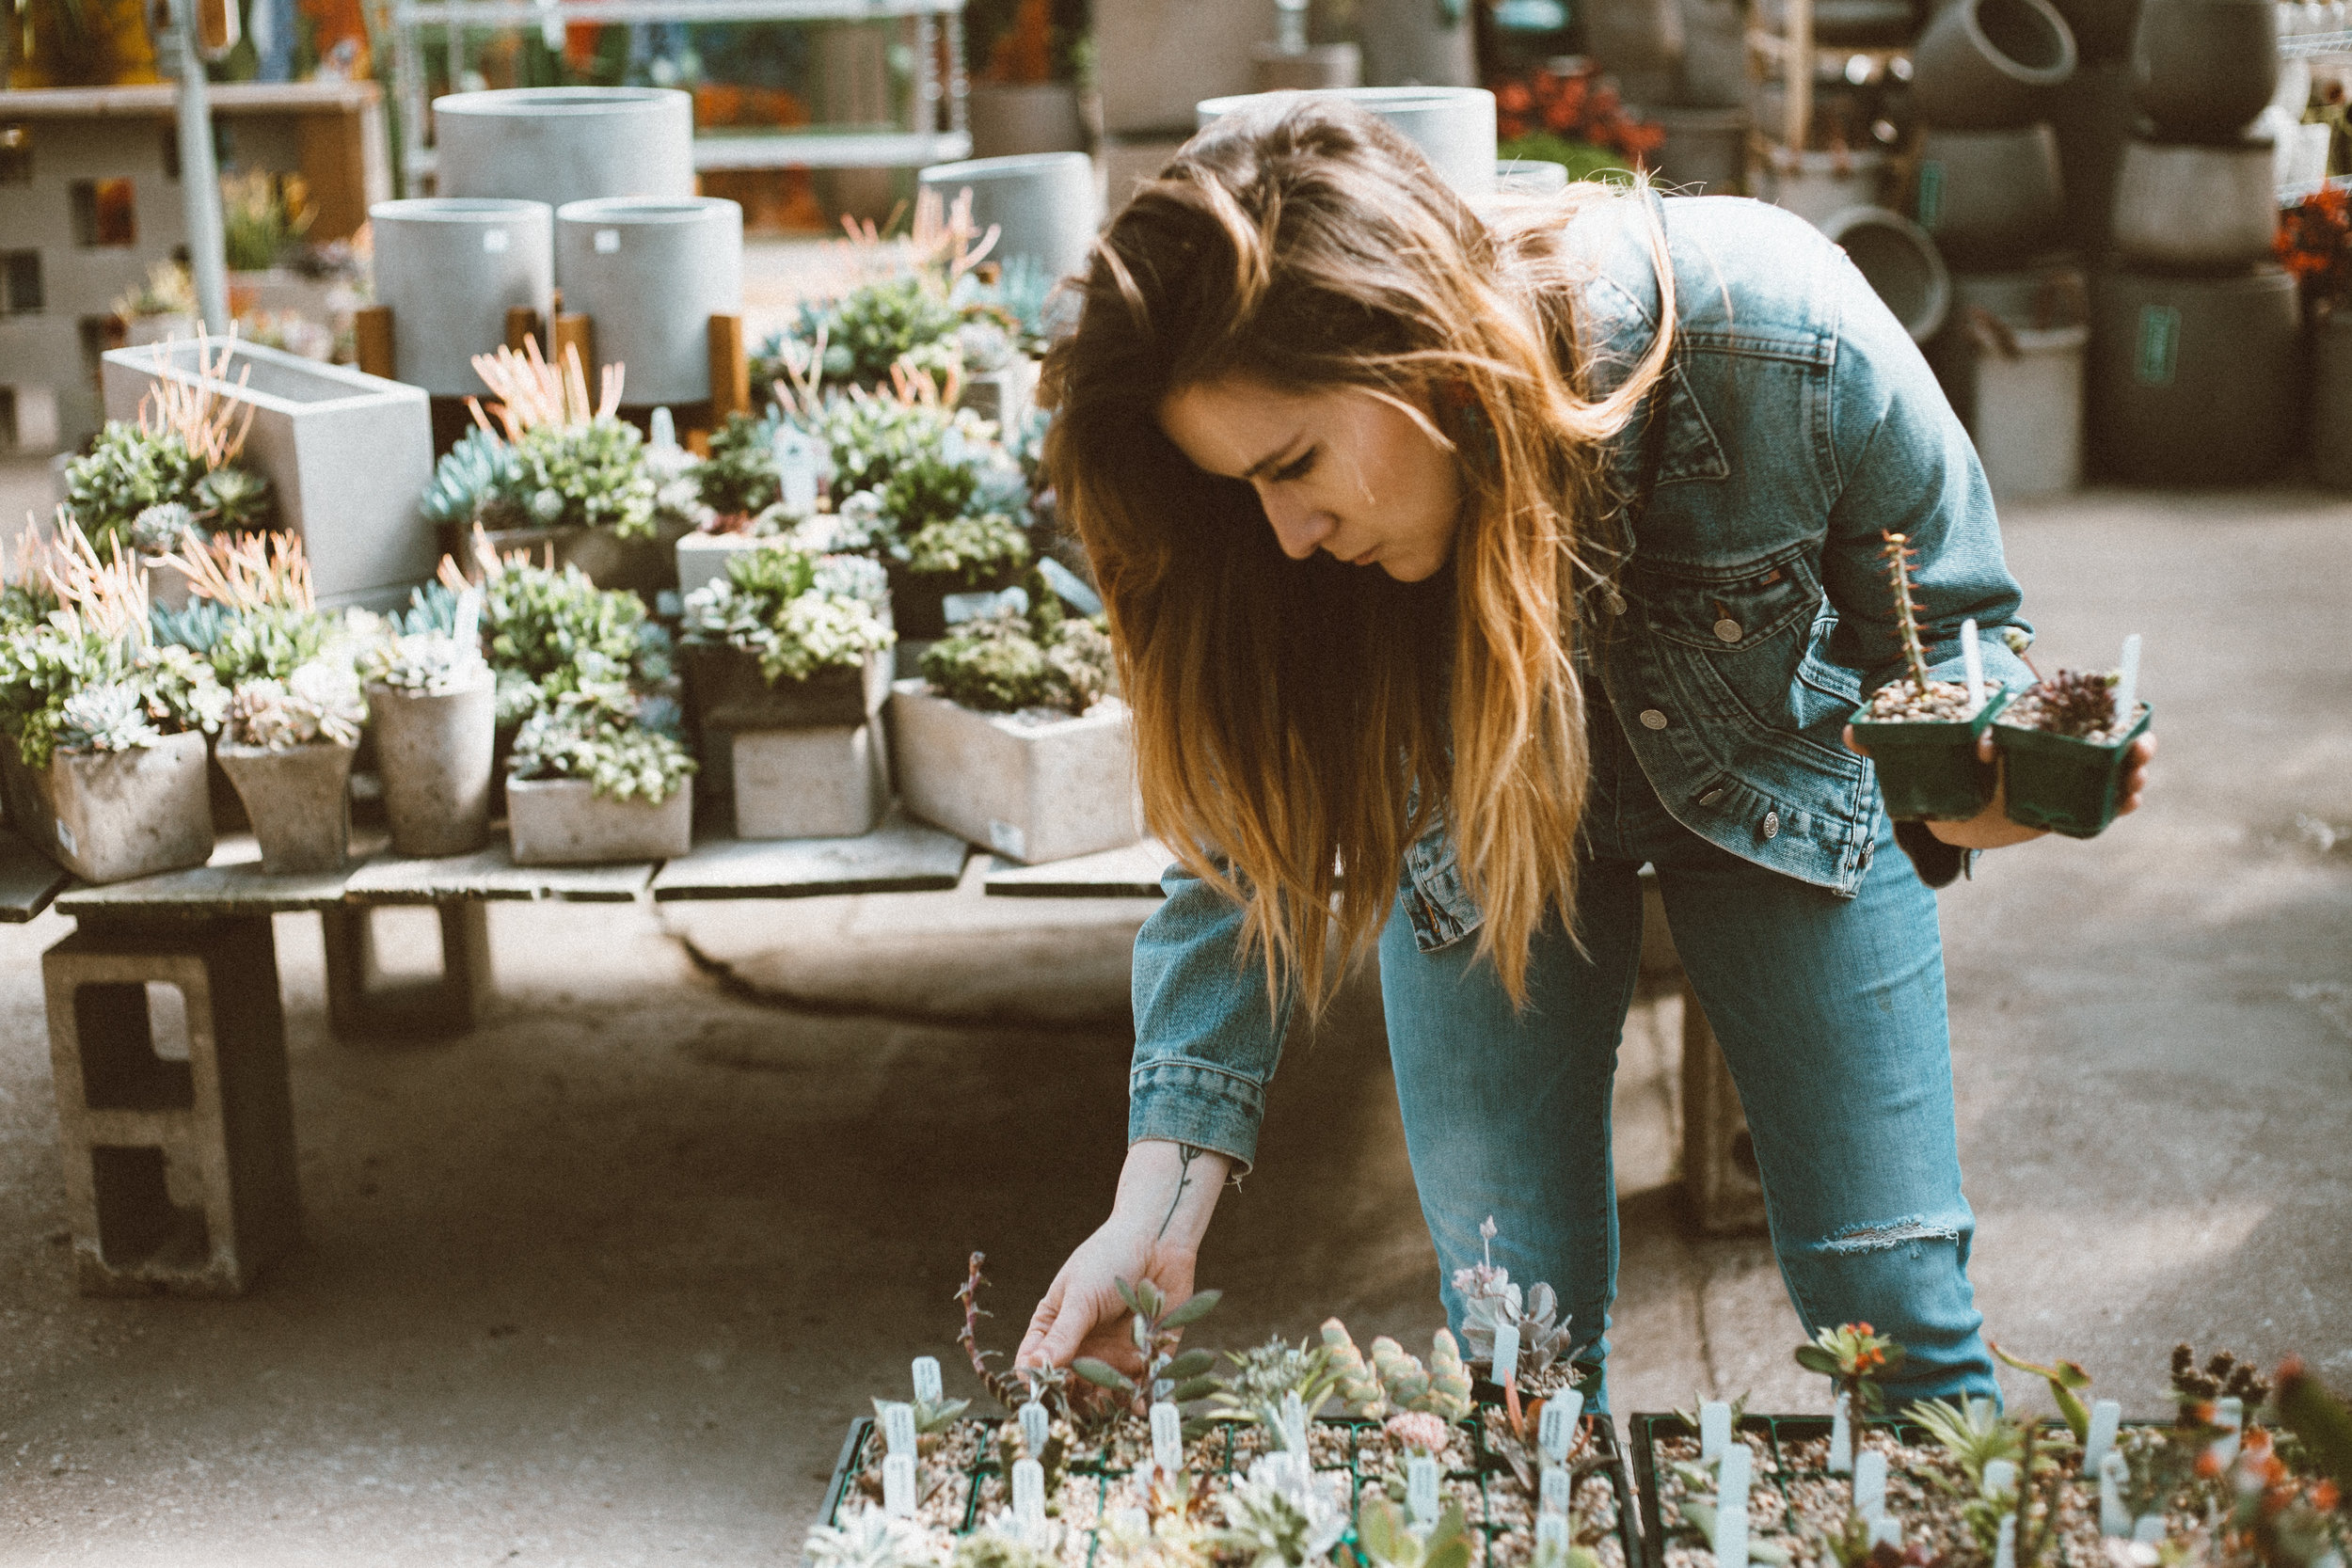 Plant-guru Erin Hawkins. All photos by Alyssa Broadus